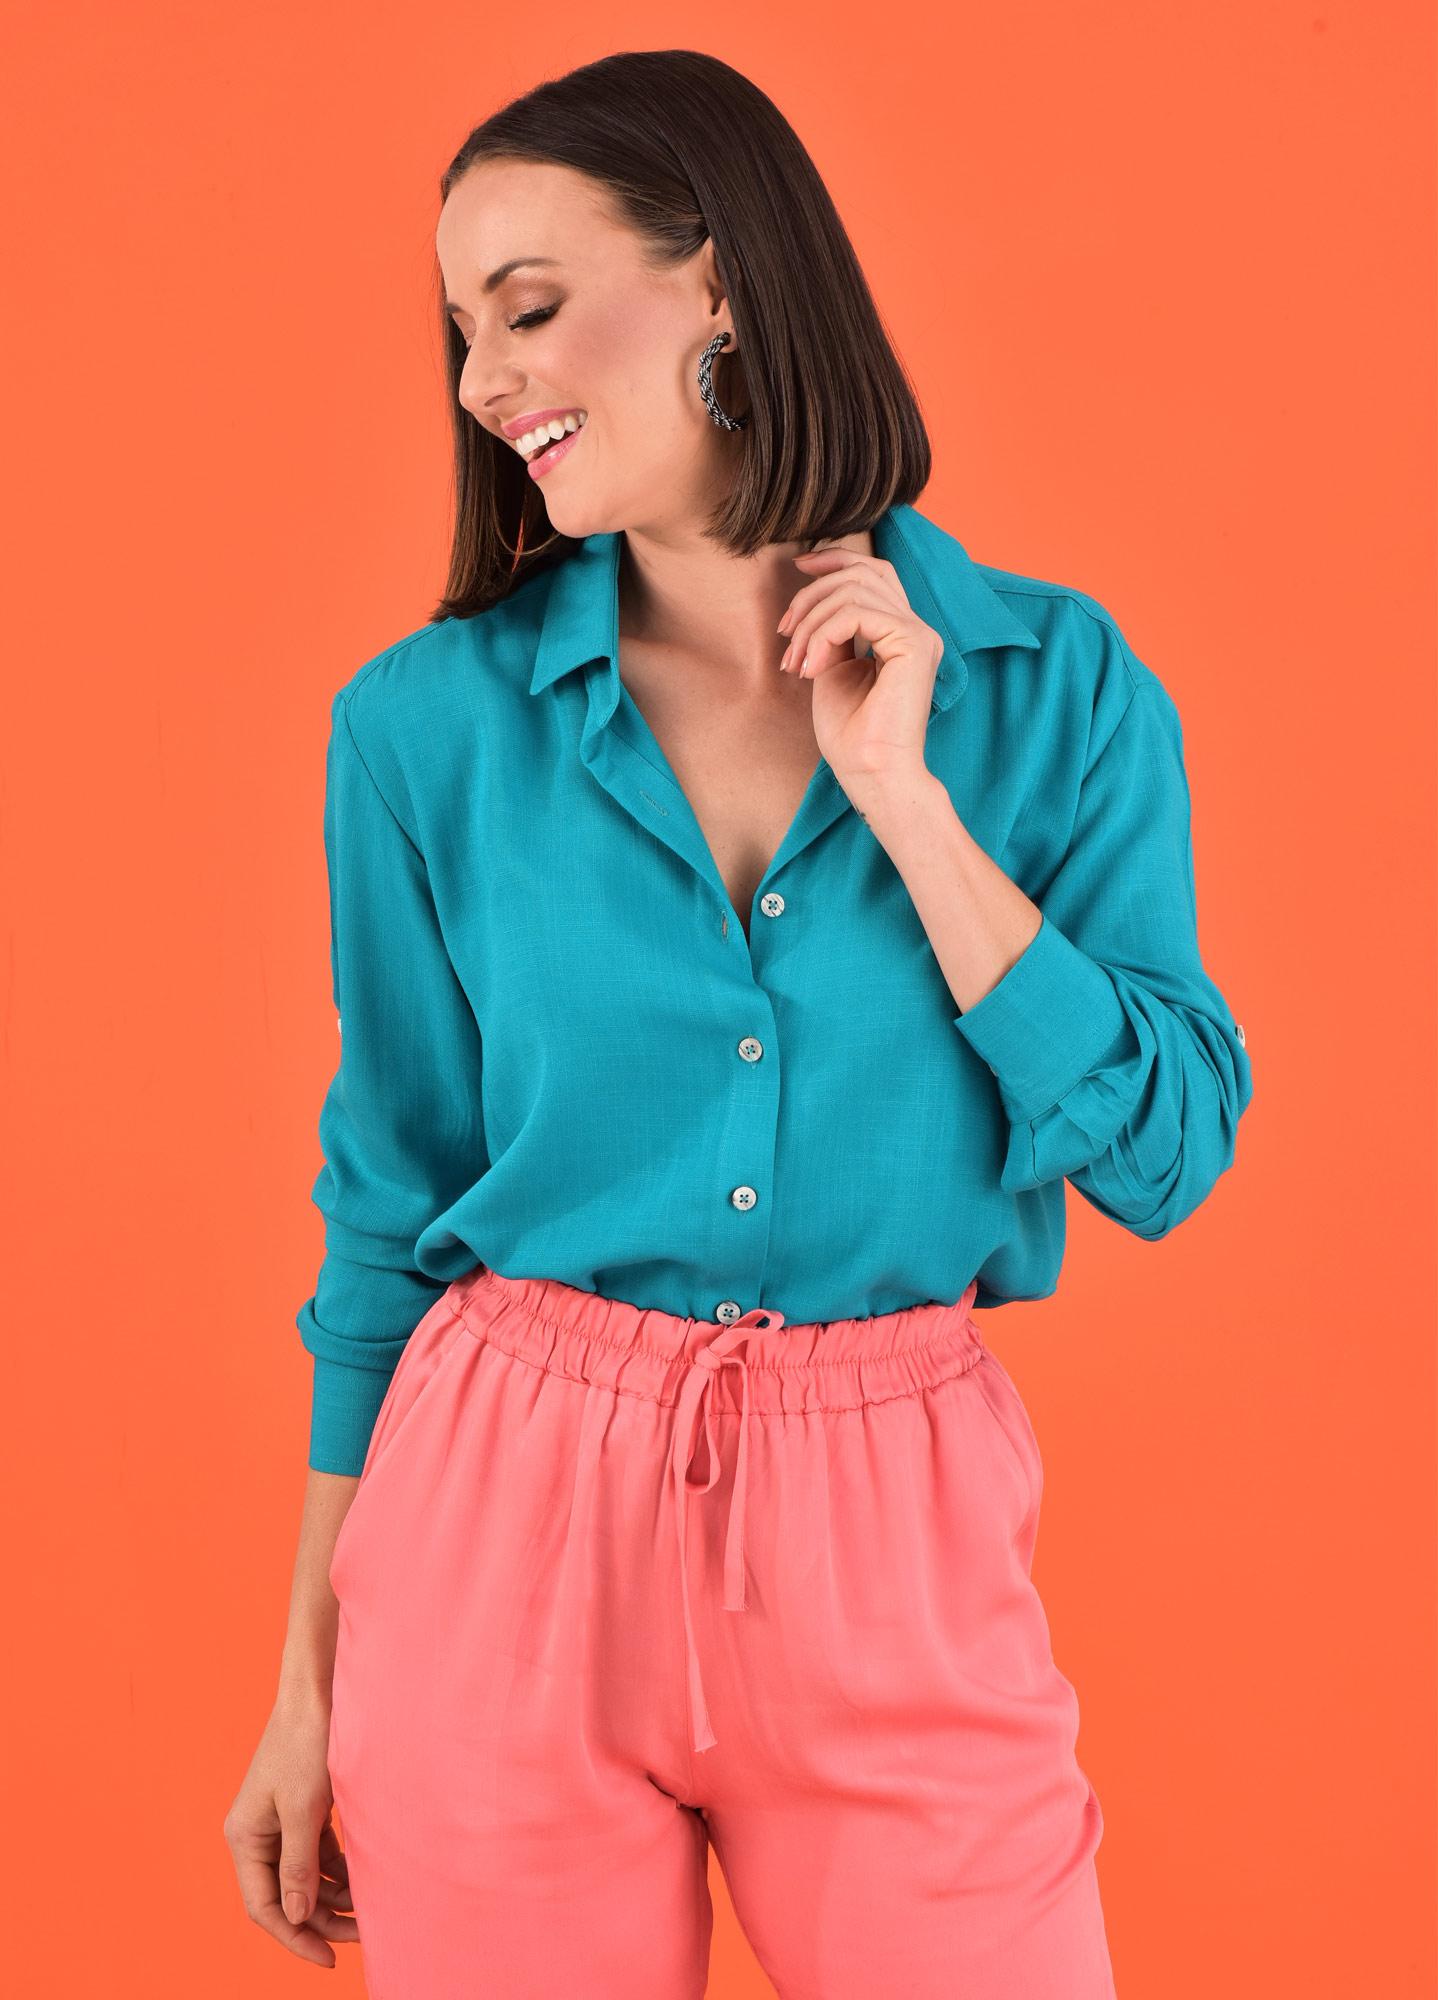 Camisa Oversized Feminina Viscolinho Aqua